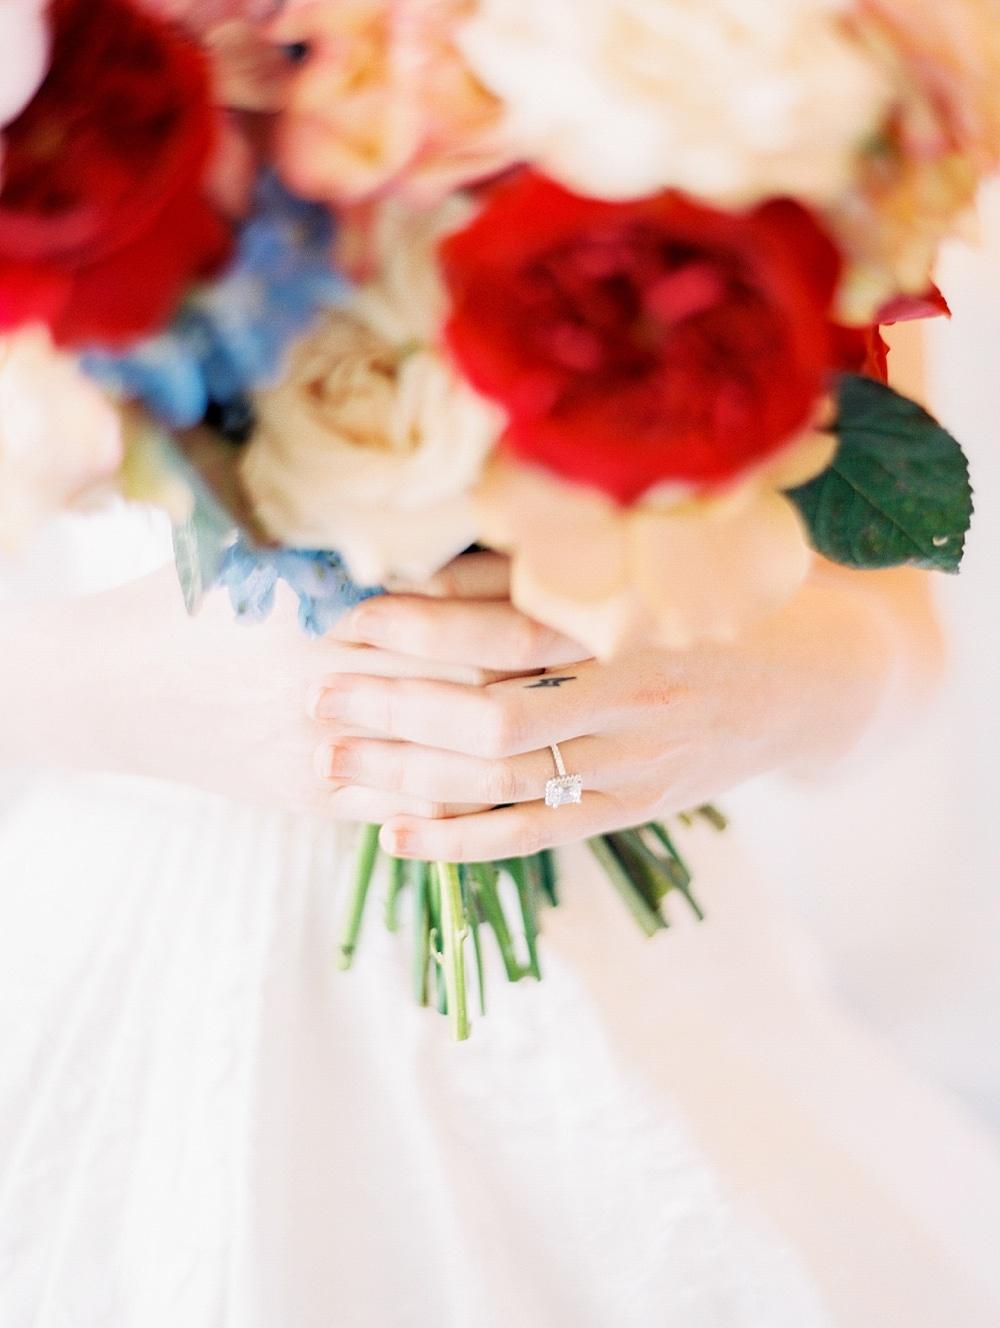 kristin-la-voie-photography-austin-wedding-photographer-woodbine-mansion-104